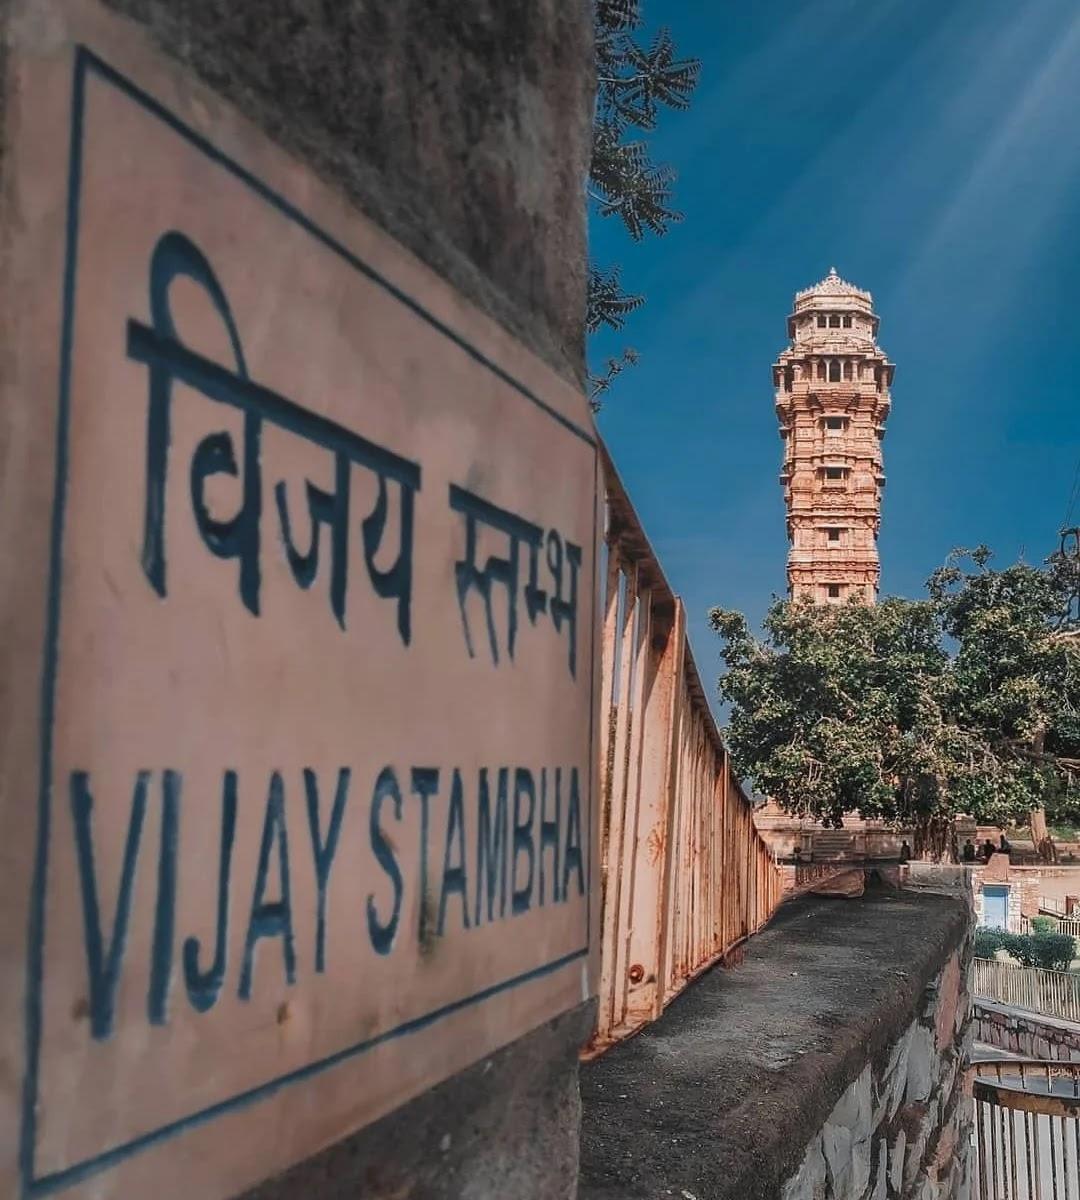 Vijay stambh chittorgarh in Hindi